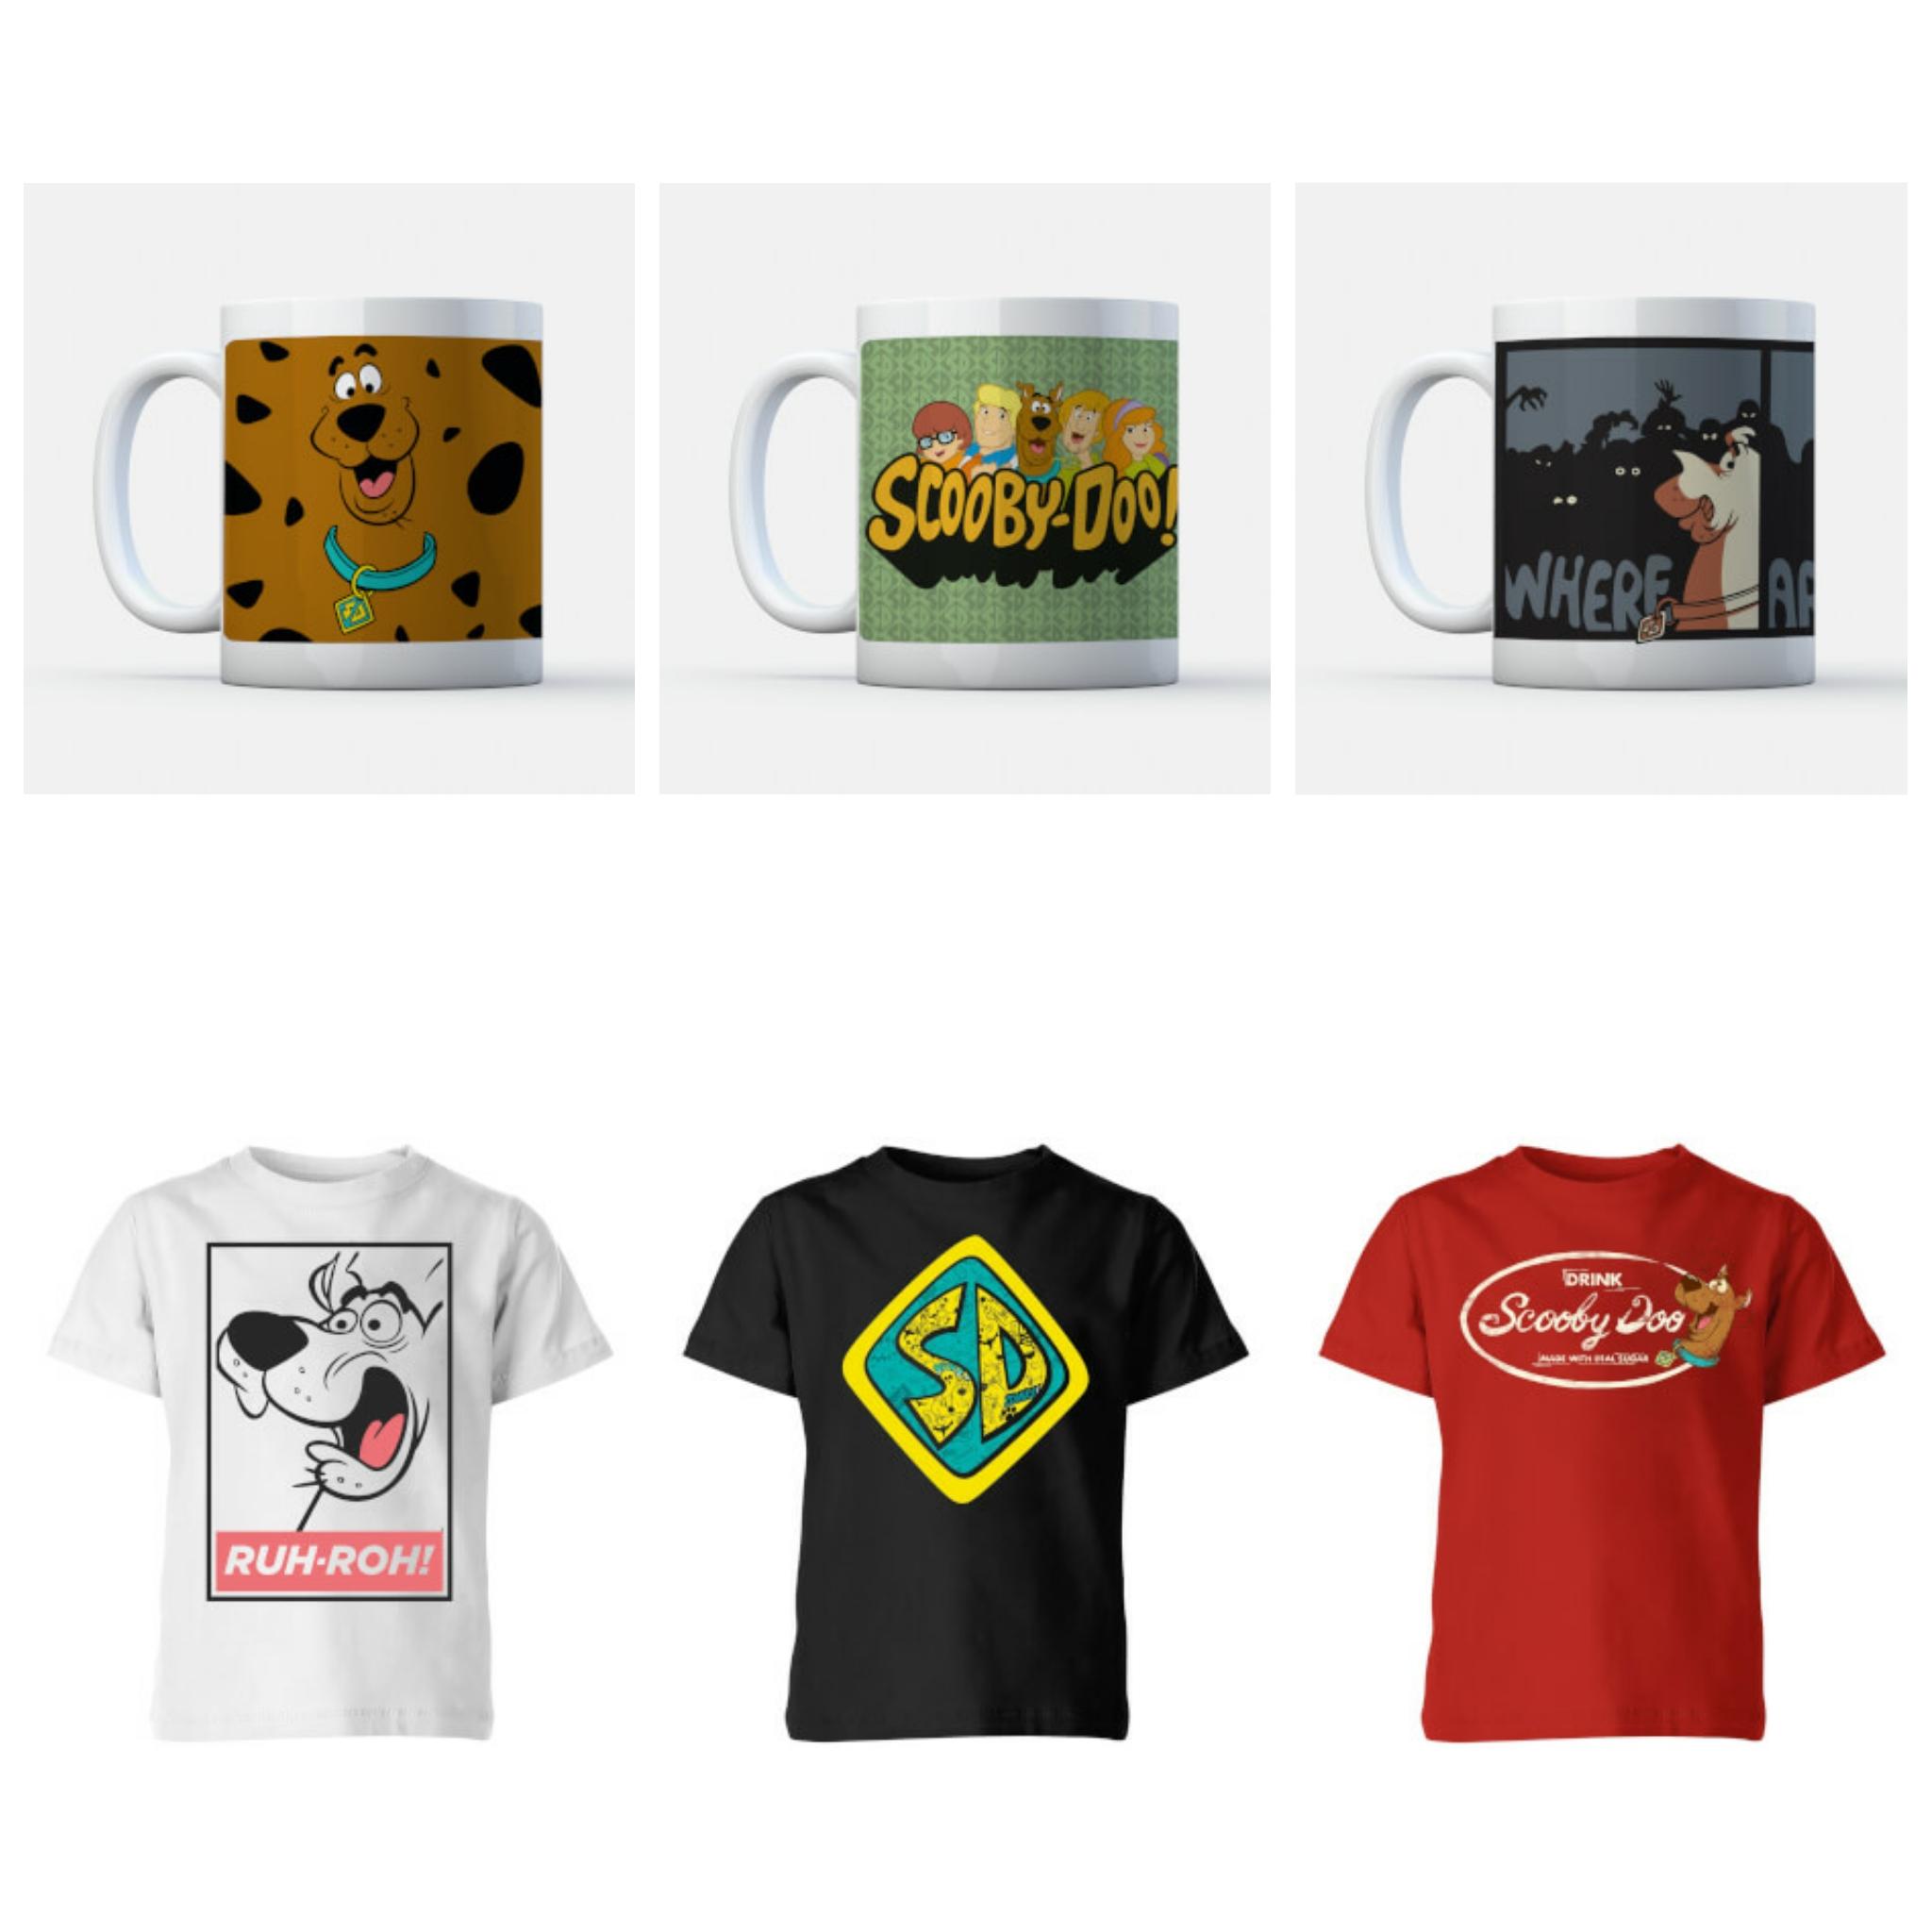 BUNDLE SCOOBY DOO: Tazza + T-Shirt